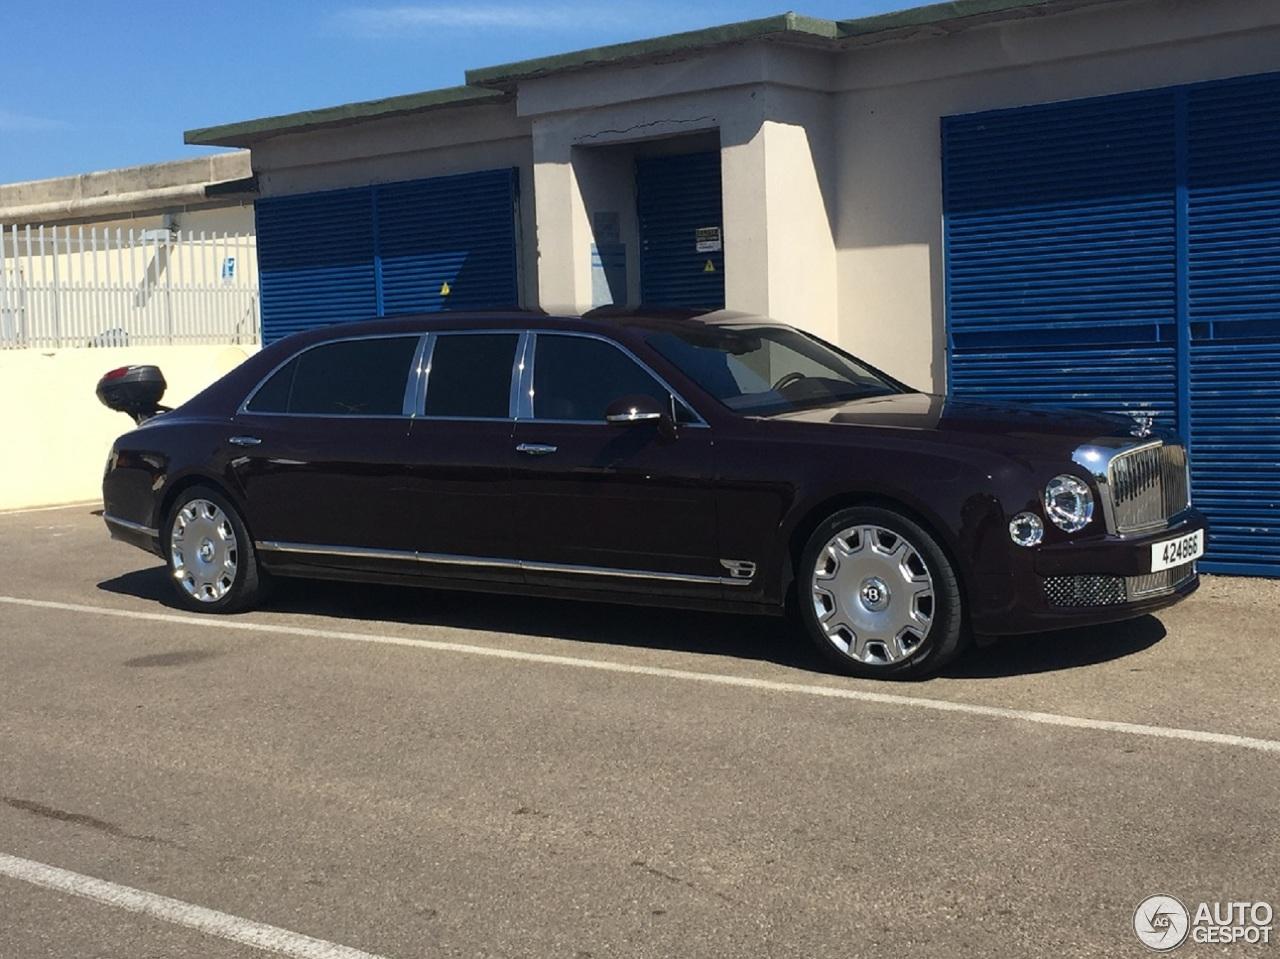 Bentley Mulsanne Grand Limousine 8 August 2016 Autogespot